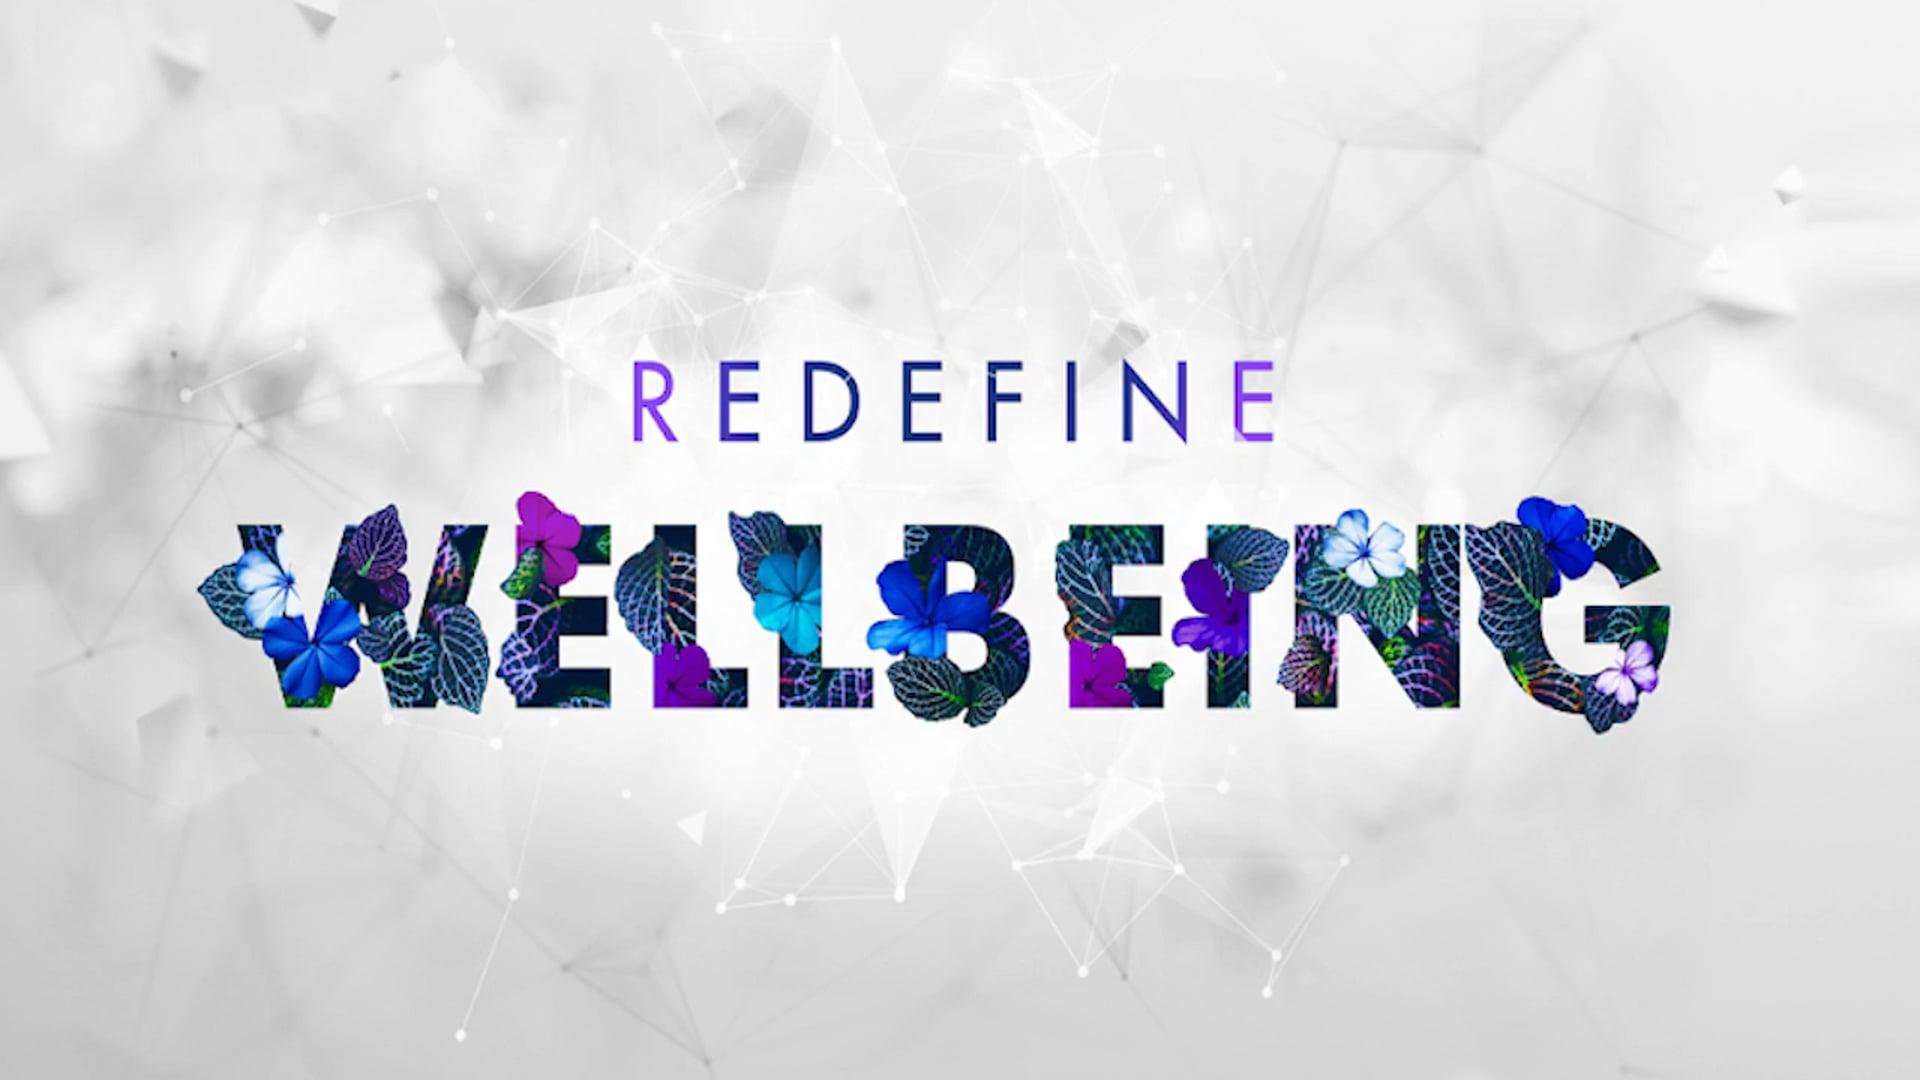 MetaMusic Journey ~ Redefine Wellbeing